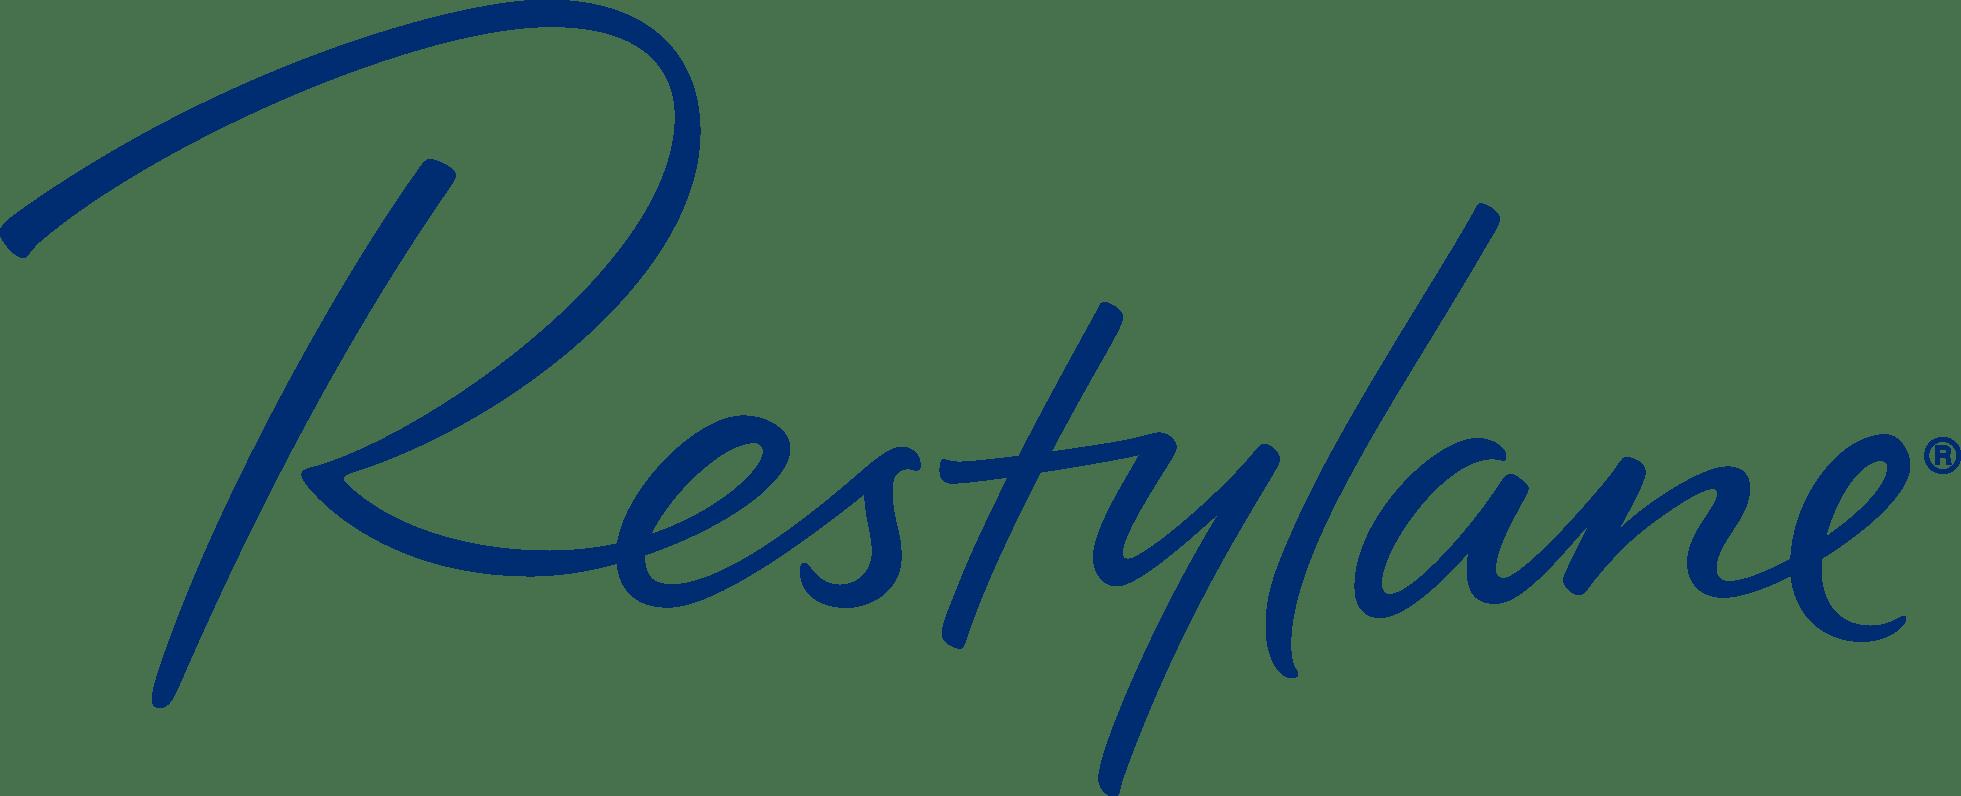 Restylane_L_RGB